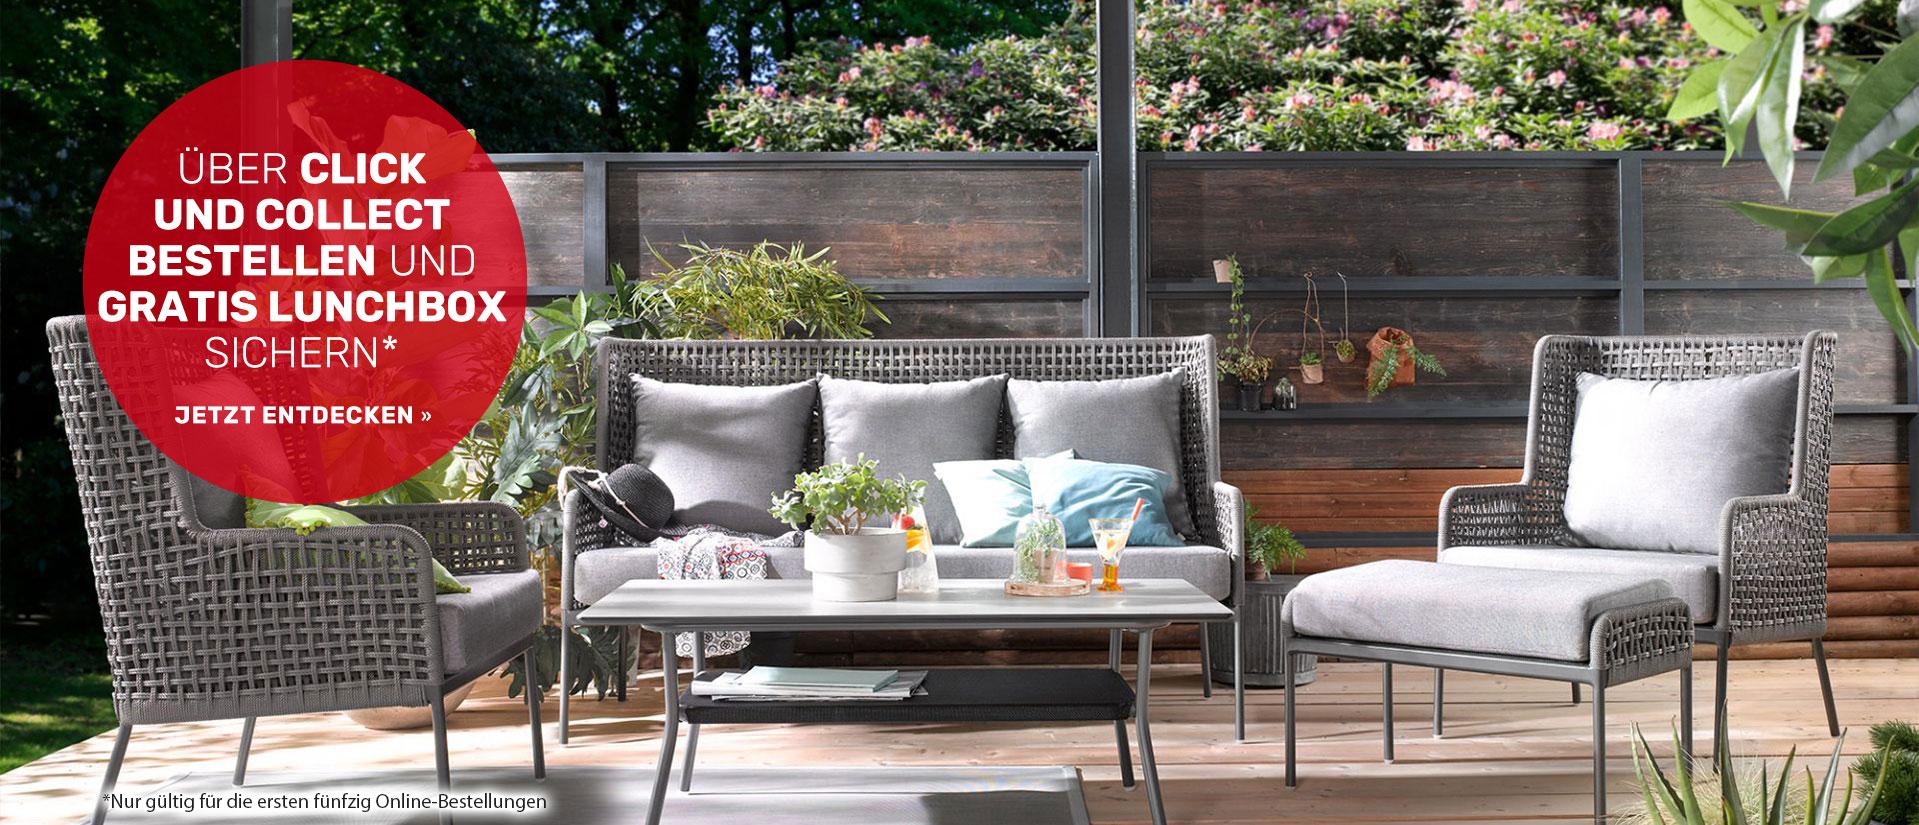 Outdoor Möbel - Im Wohn Schick Online Shop bestellen - Click & Collect